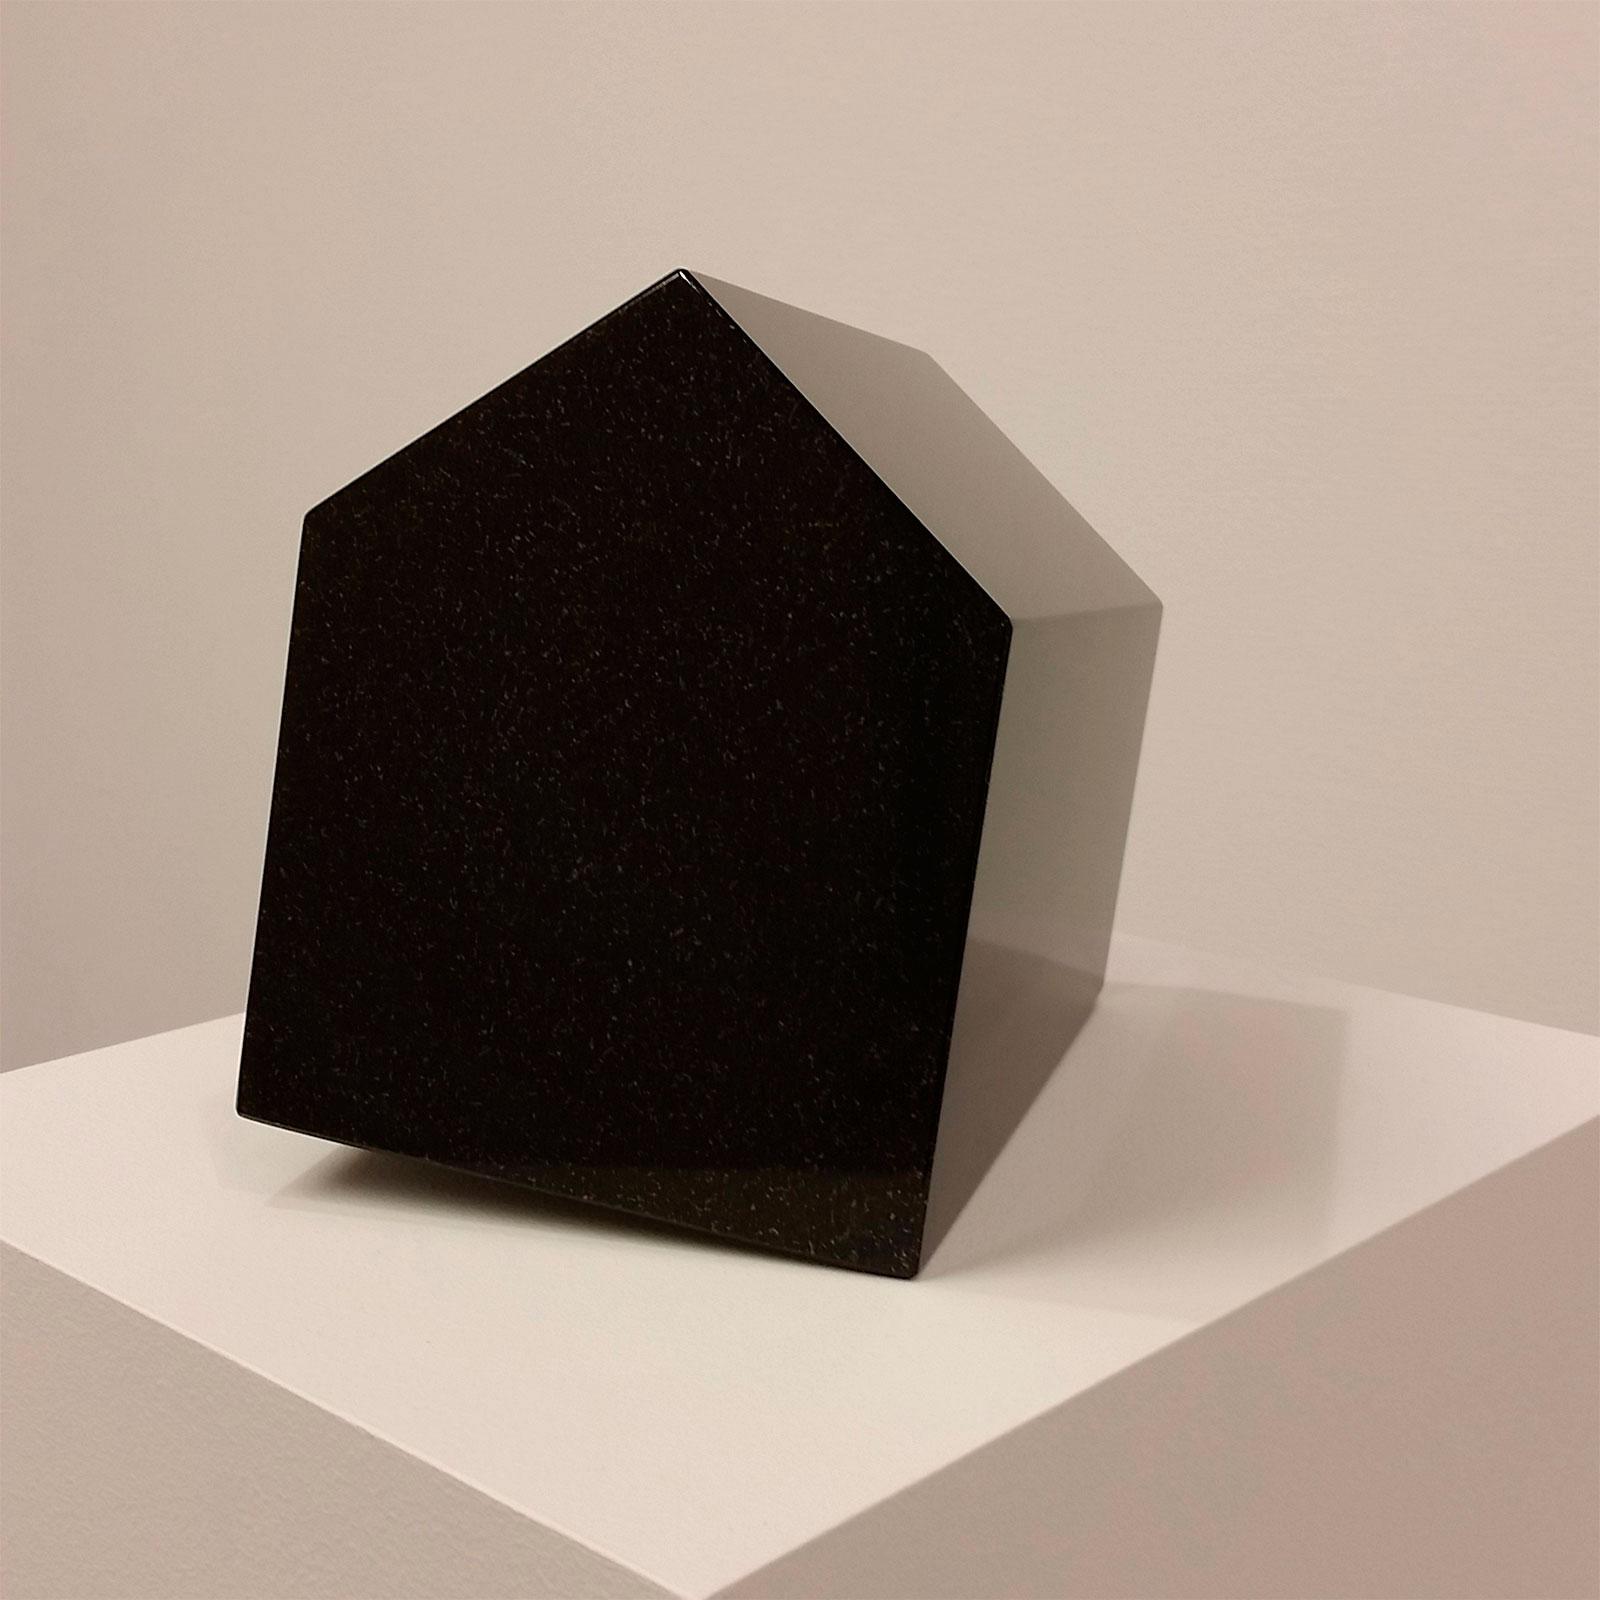 "Hillevi Berglund, ""Härbärge"" (Hostel), 2014. Diabase, 17 x 14 x 13cm"